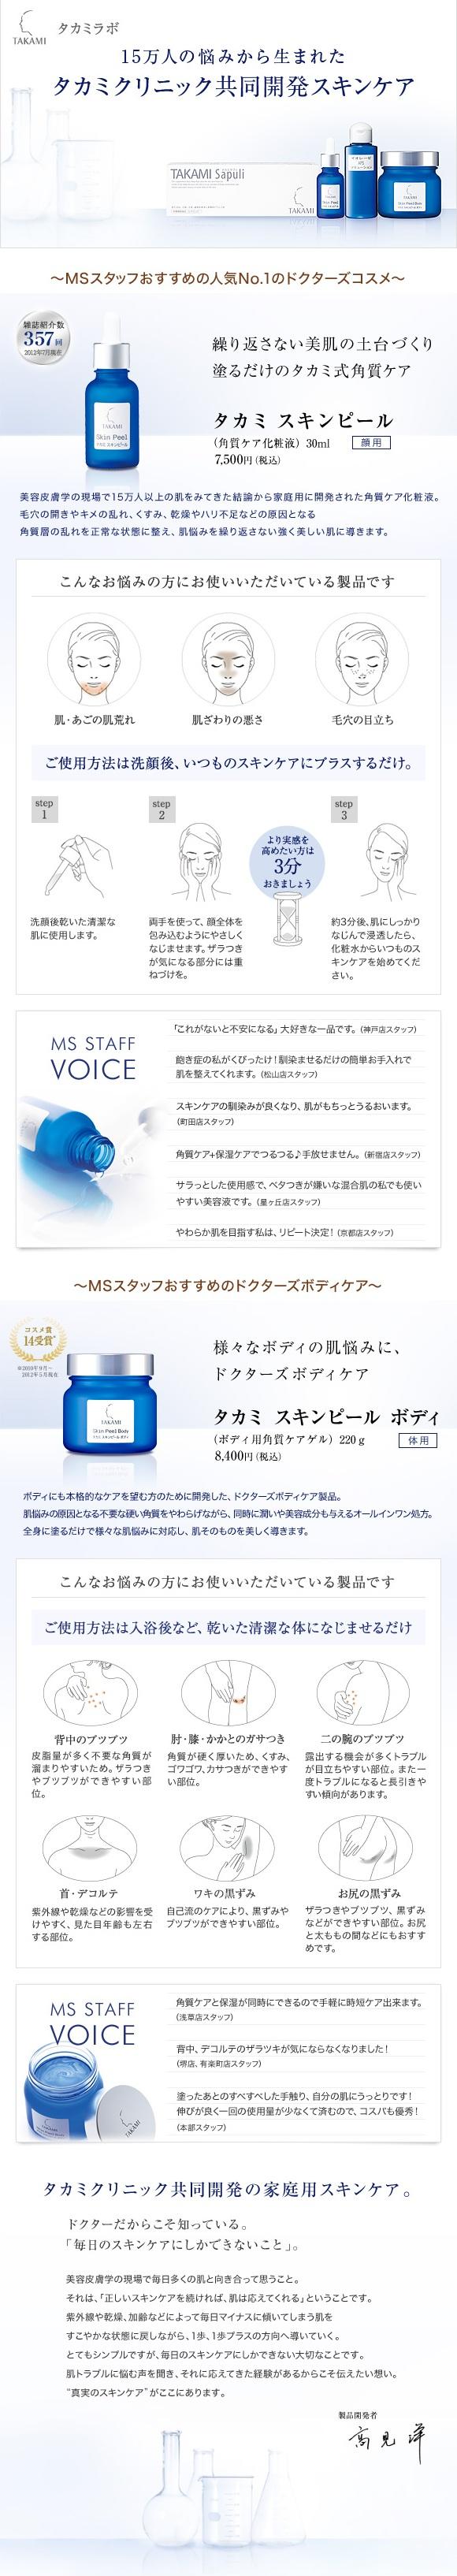 ms_style.jpg